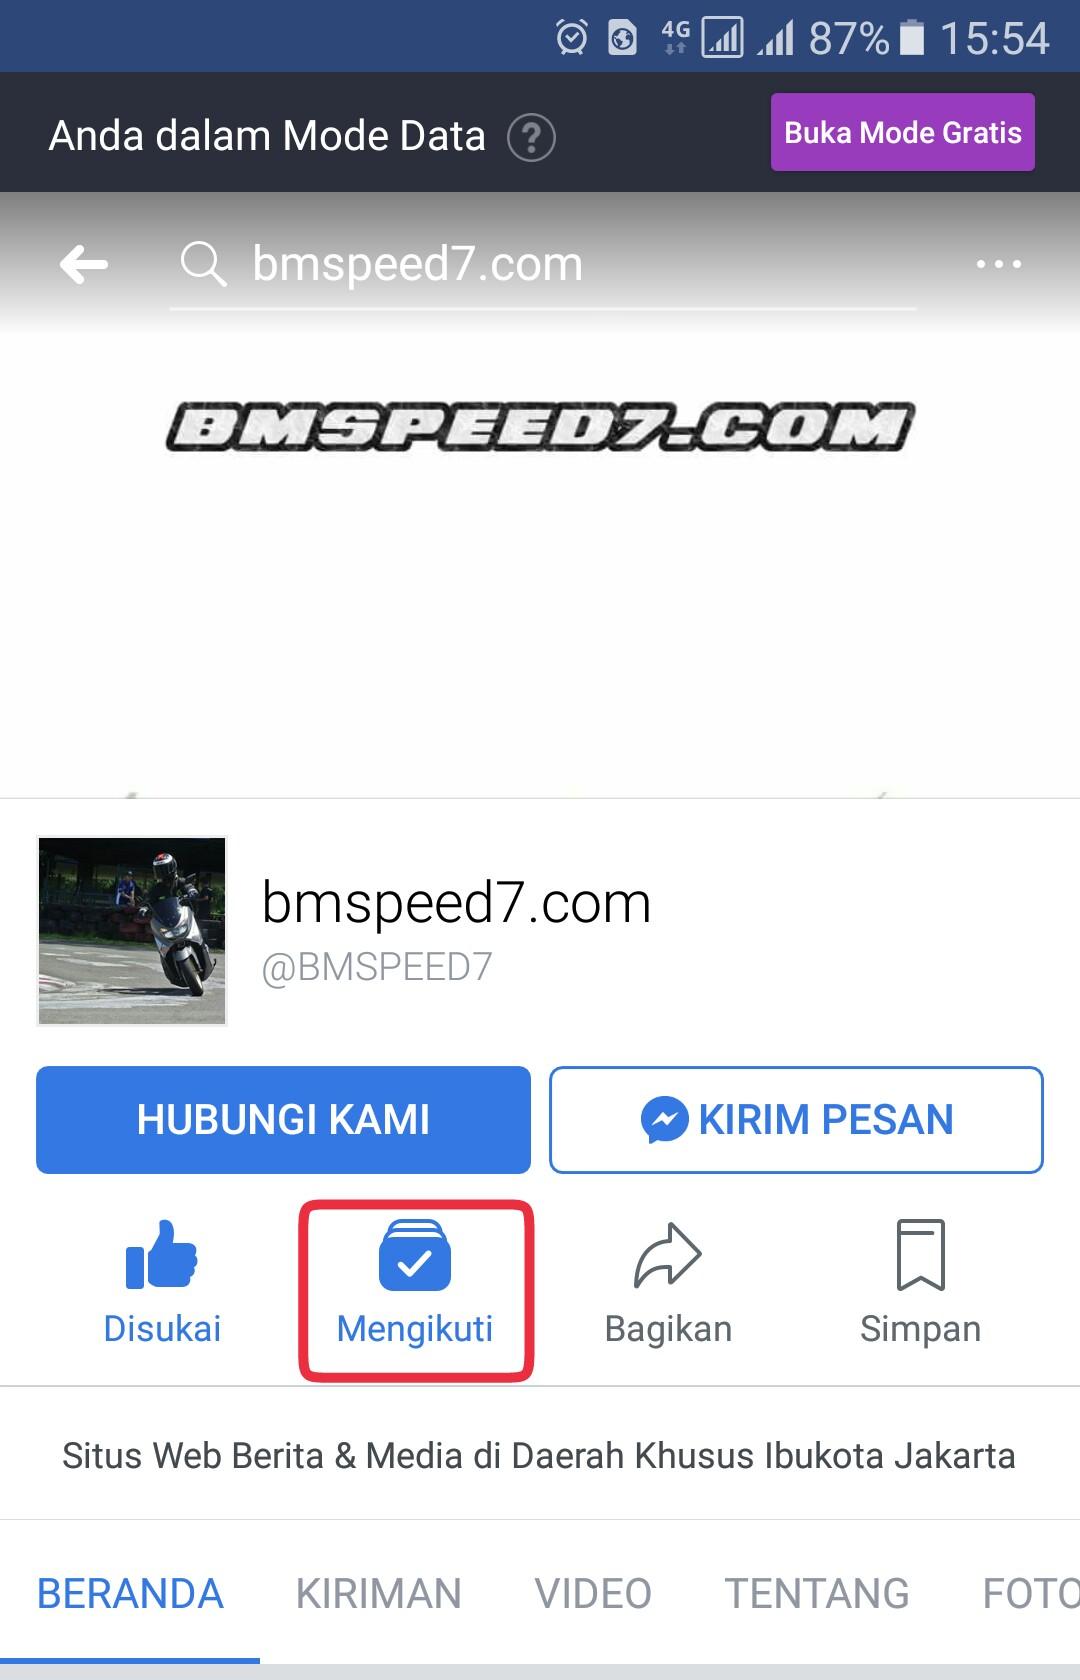 Cara-Setting-Fanspage-Facebook-Agar-Yang-Ngelike-Mendapat-Berita-BMSPEED7.COM_